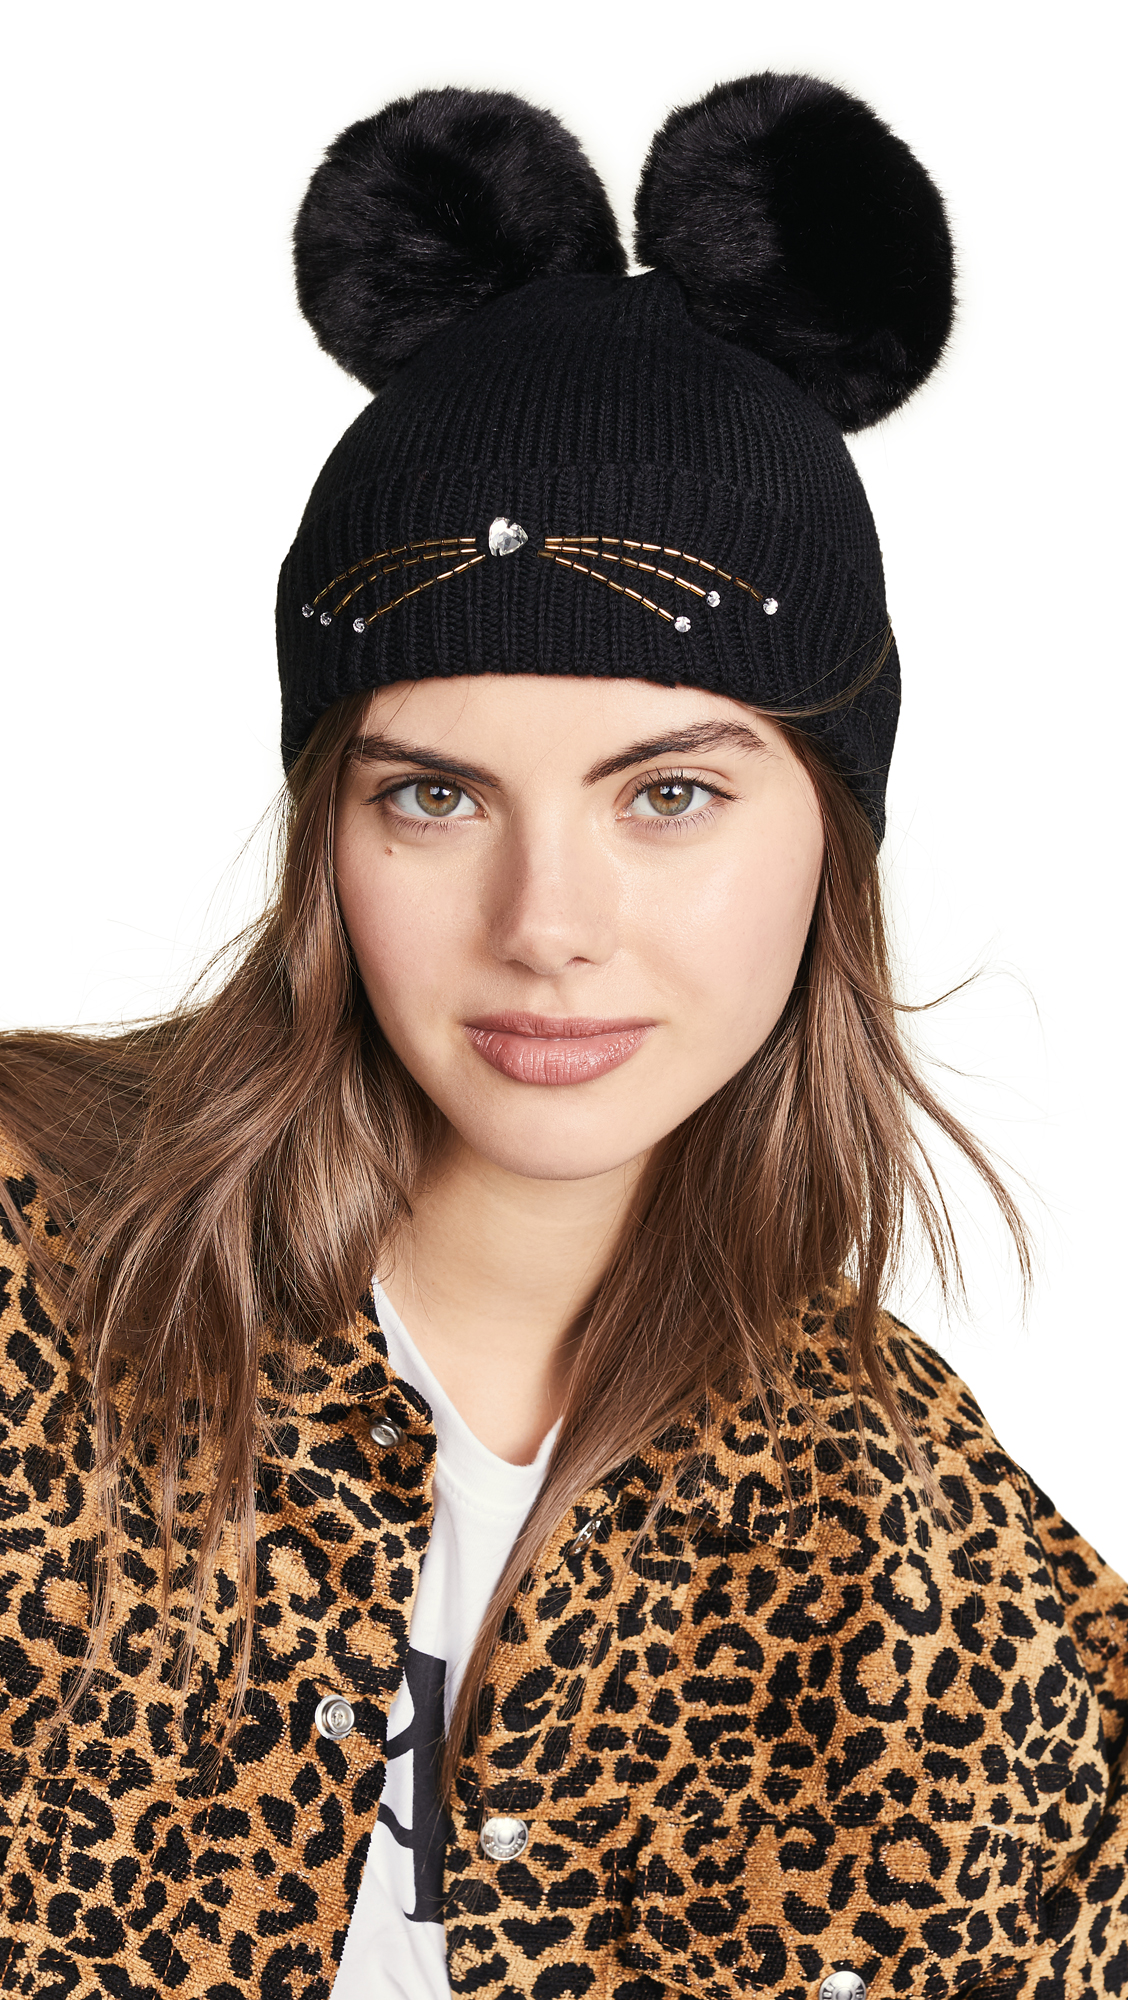 Kate Spade New York Embellished Cat Beanie Hat In Black